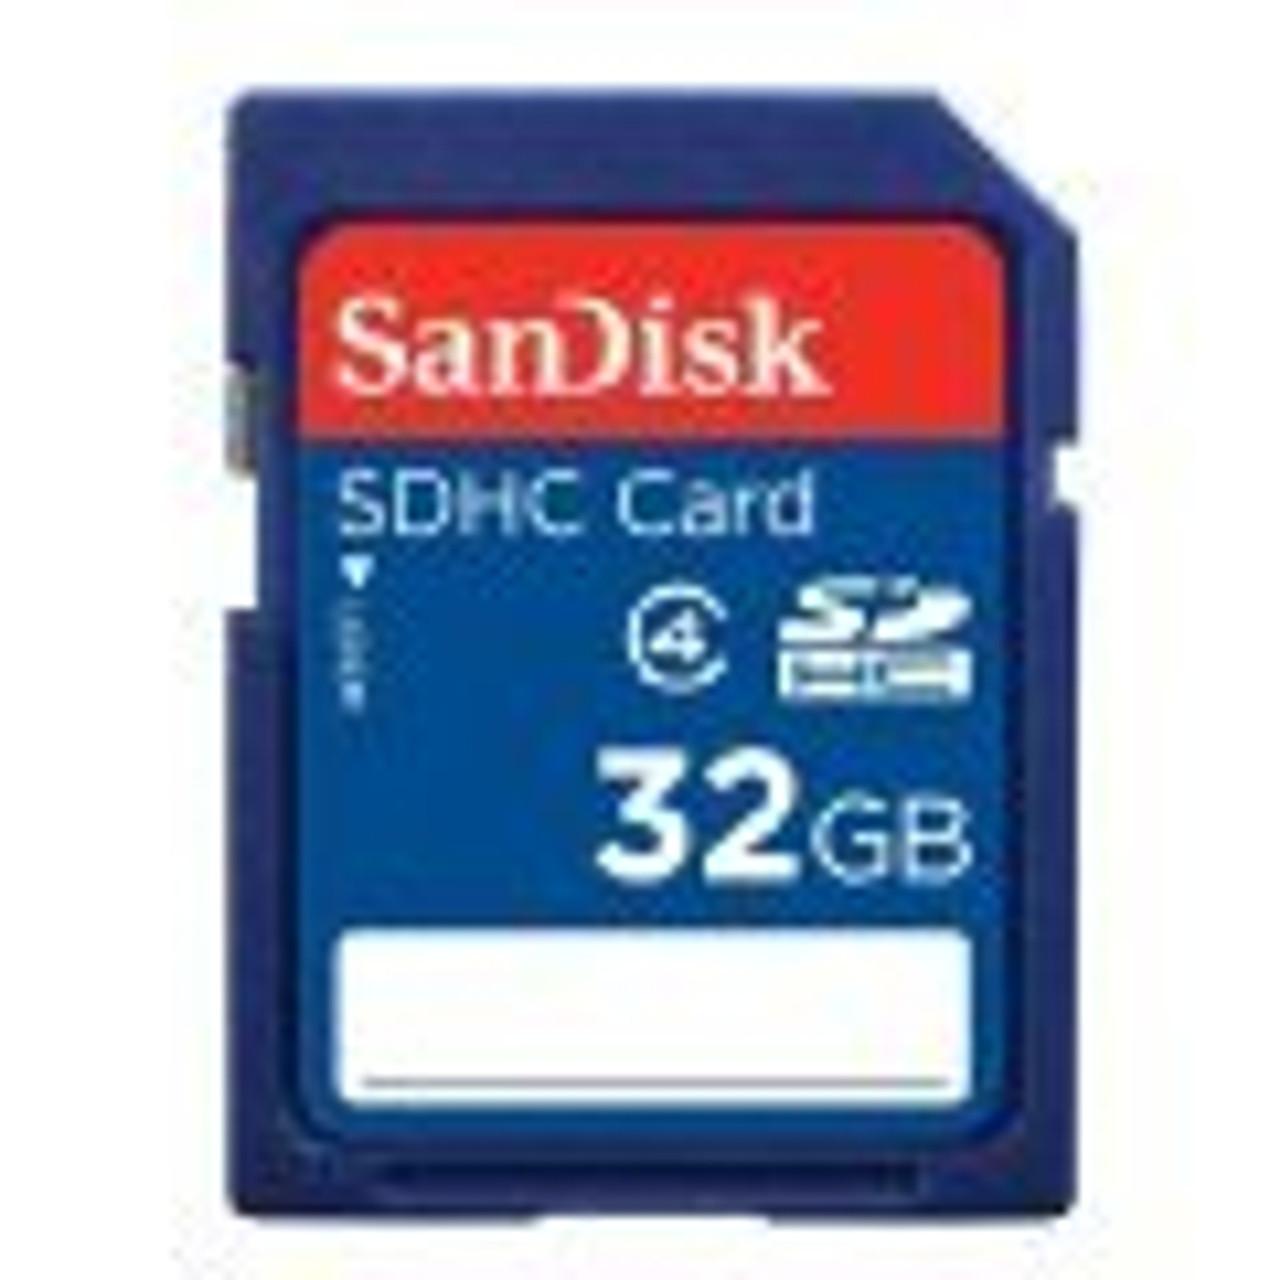 SD & SDHC Cards